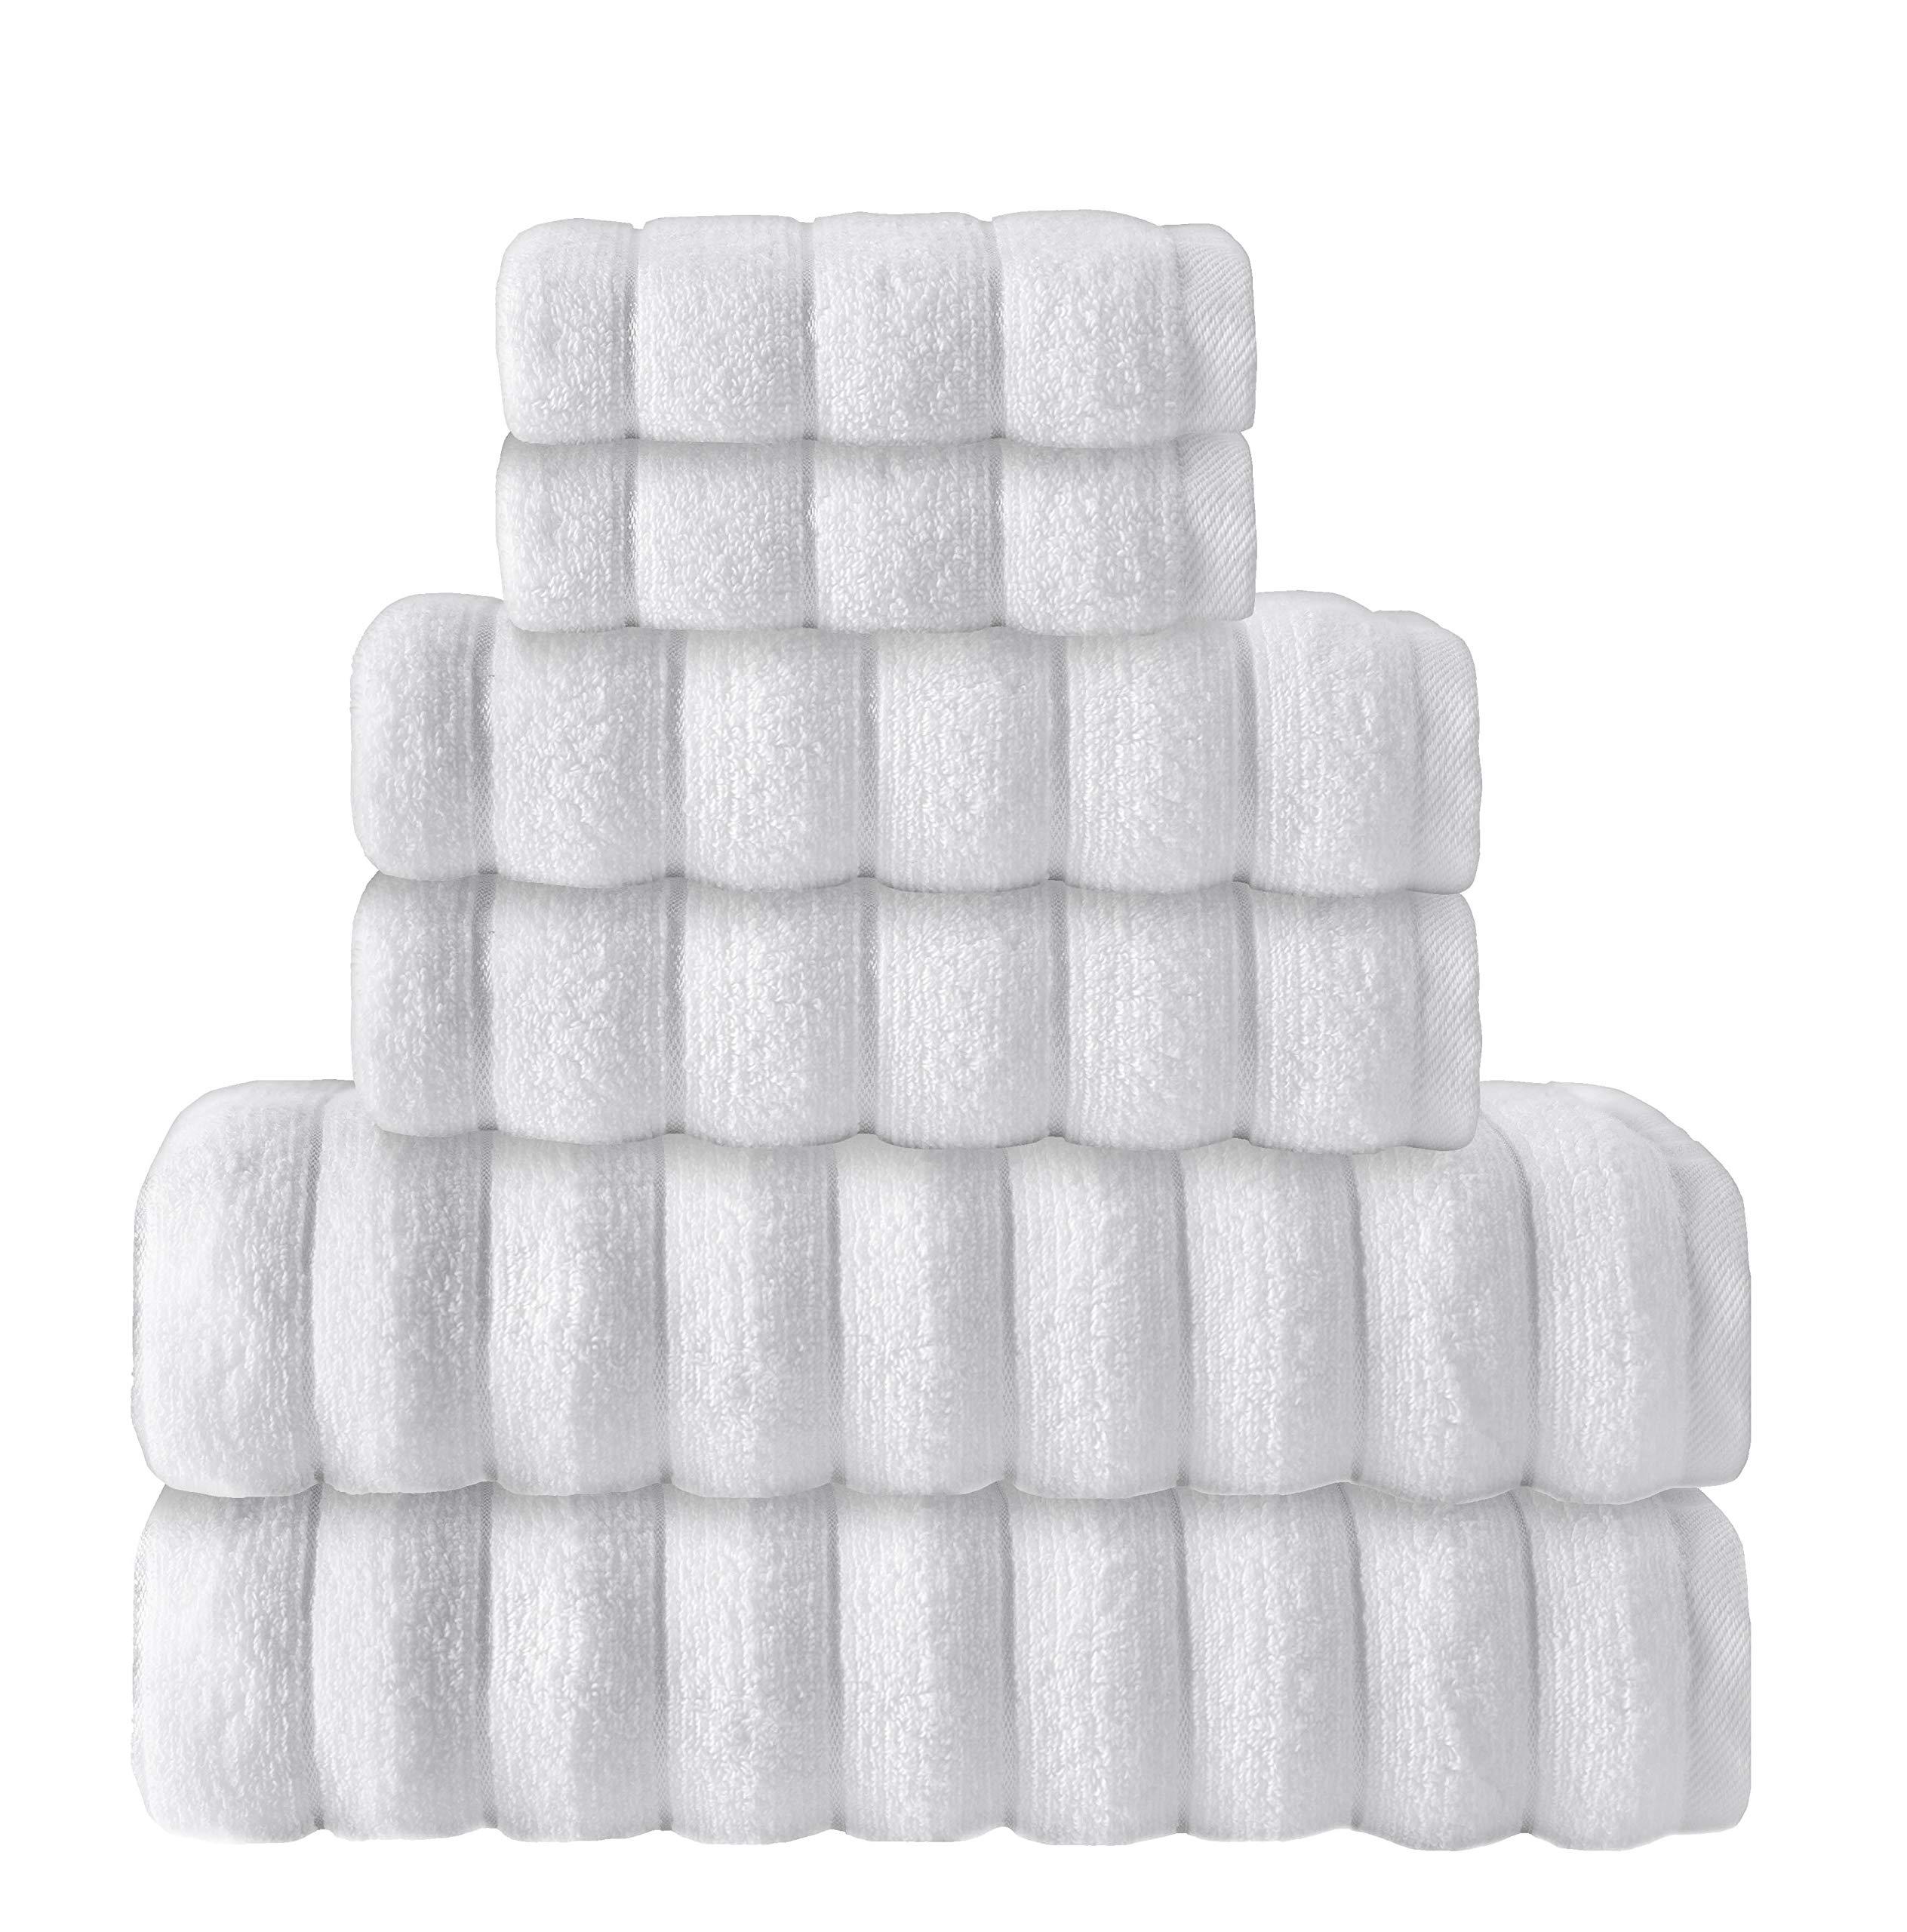 Enchante Home 6 Piece 100% Turkish Cotton Luxury Towel Set for Home & Spa - Quality Soft & Absorbent - Hand, Wash & Bath Towels, Jacquard, Vague Design (White)